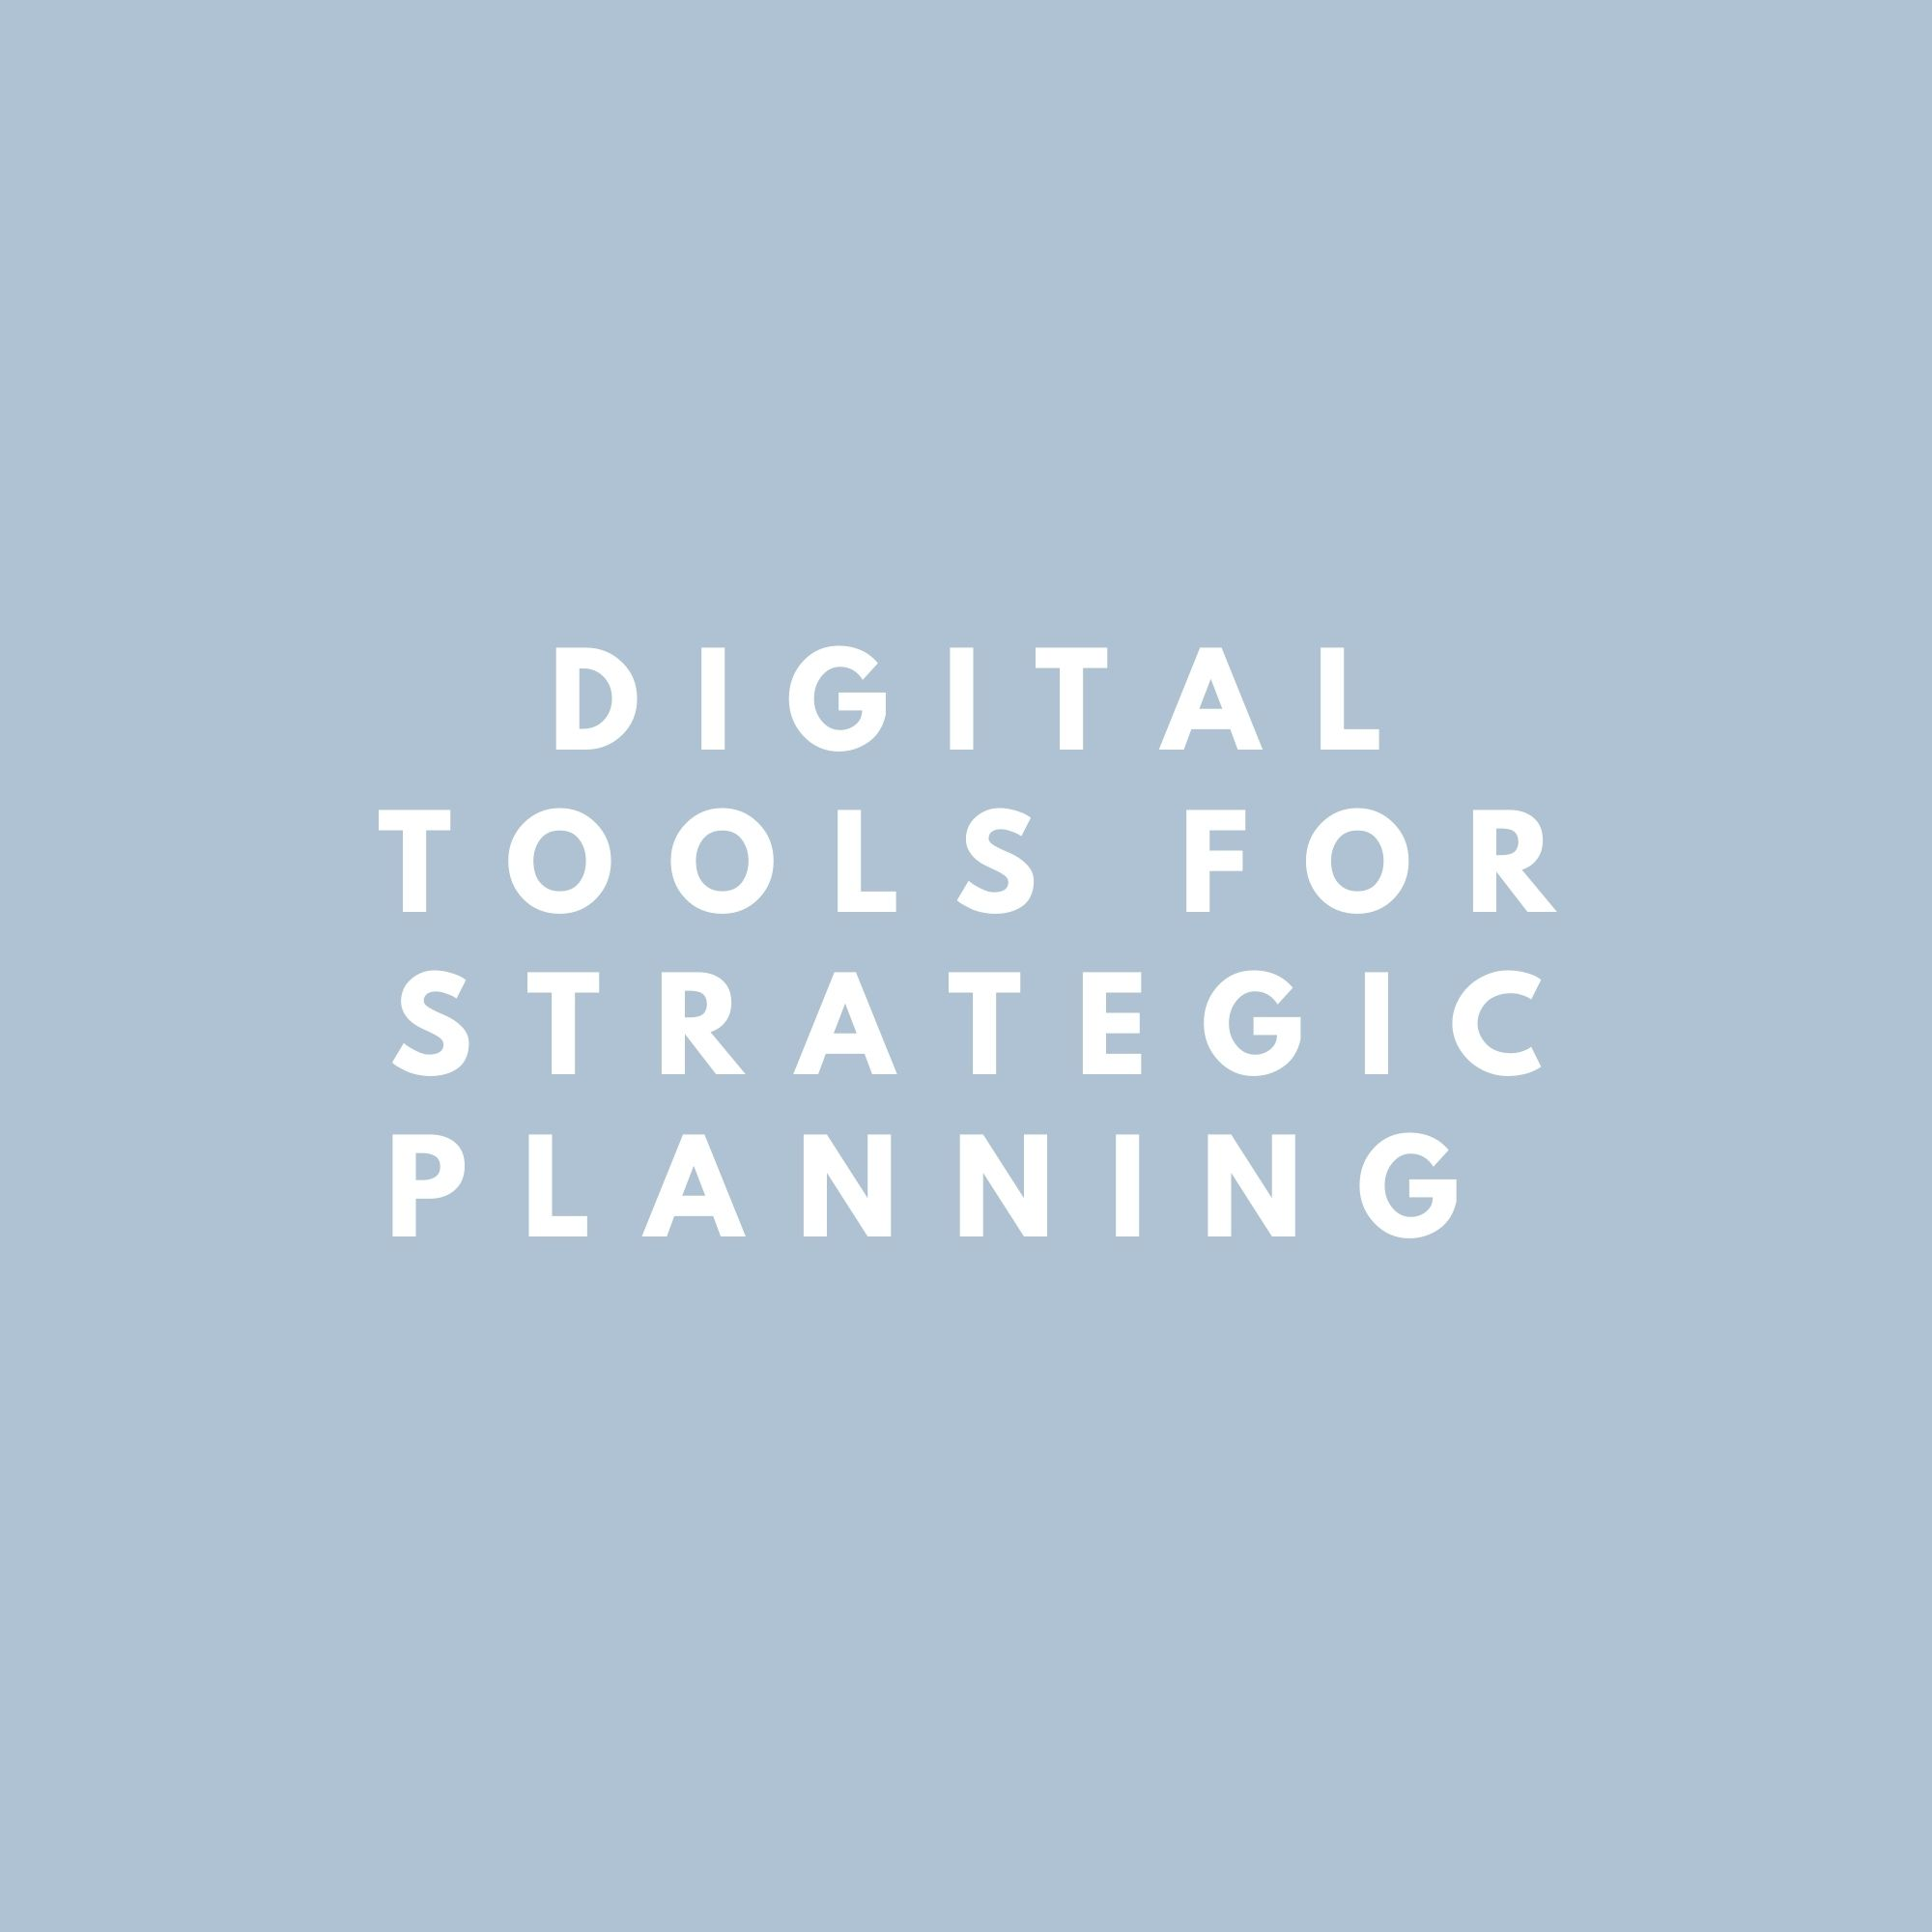 Digital Tools for Strategic Planning